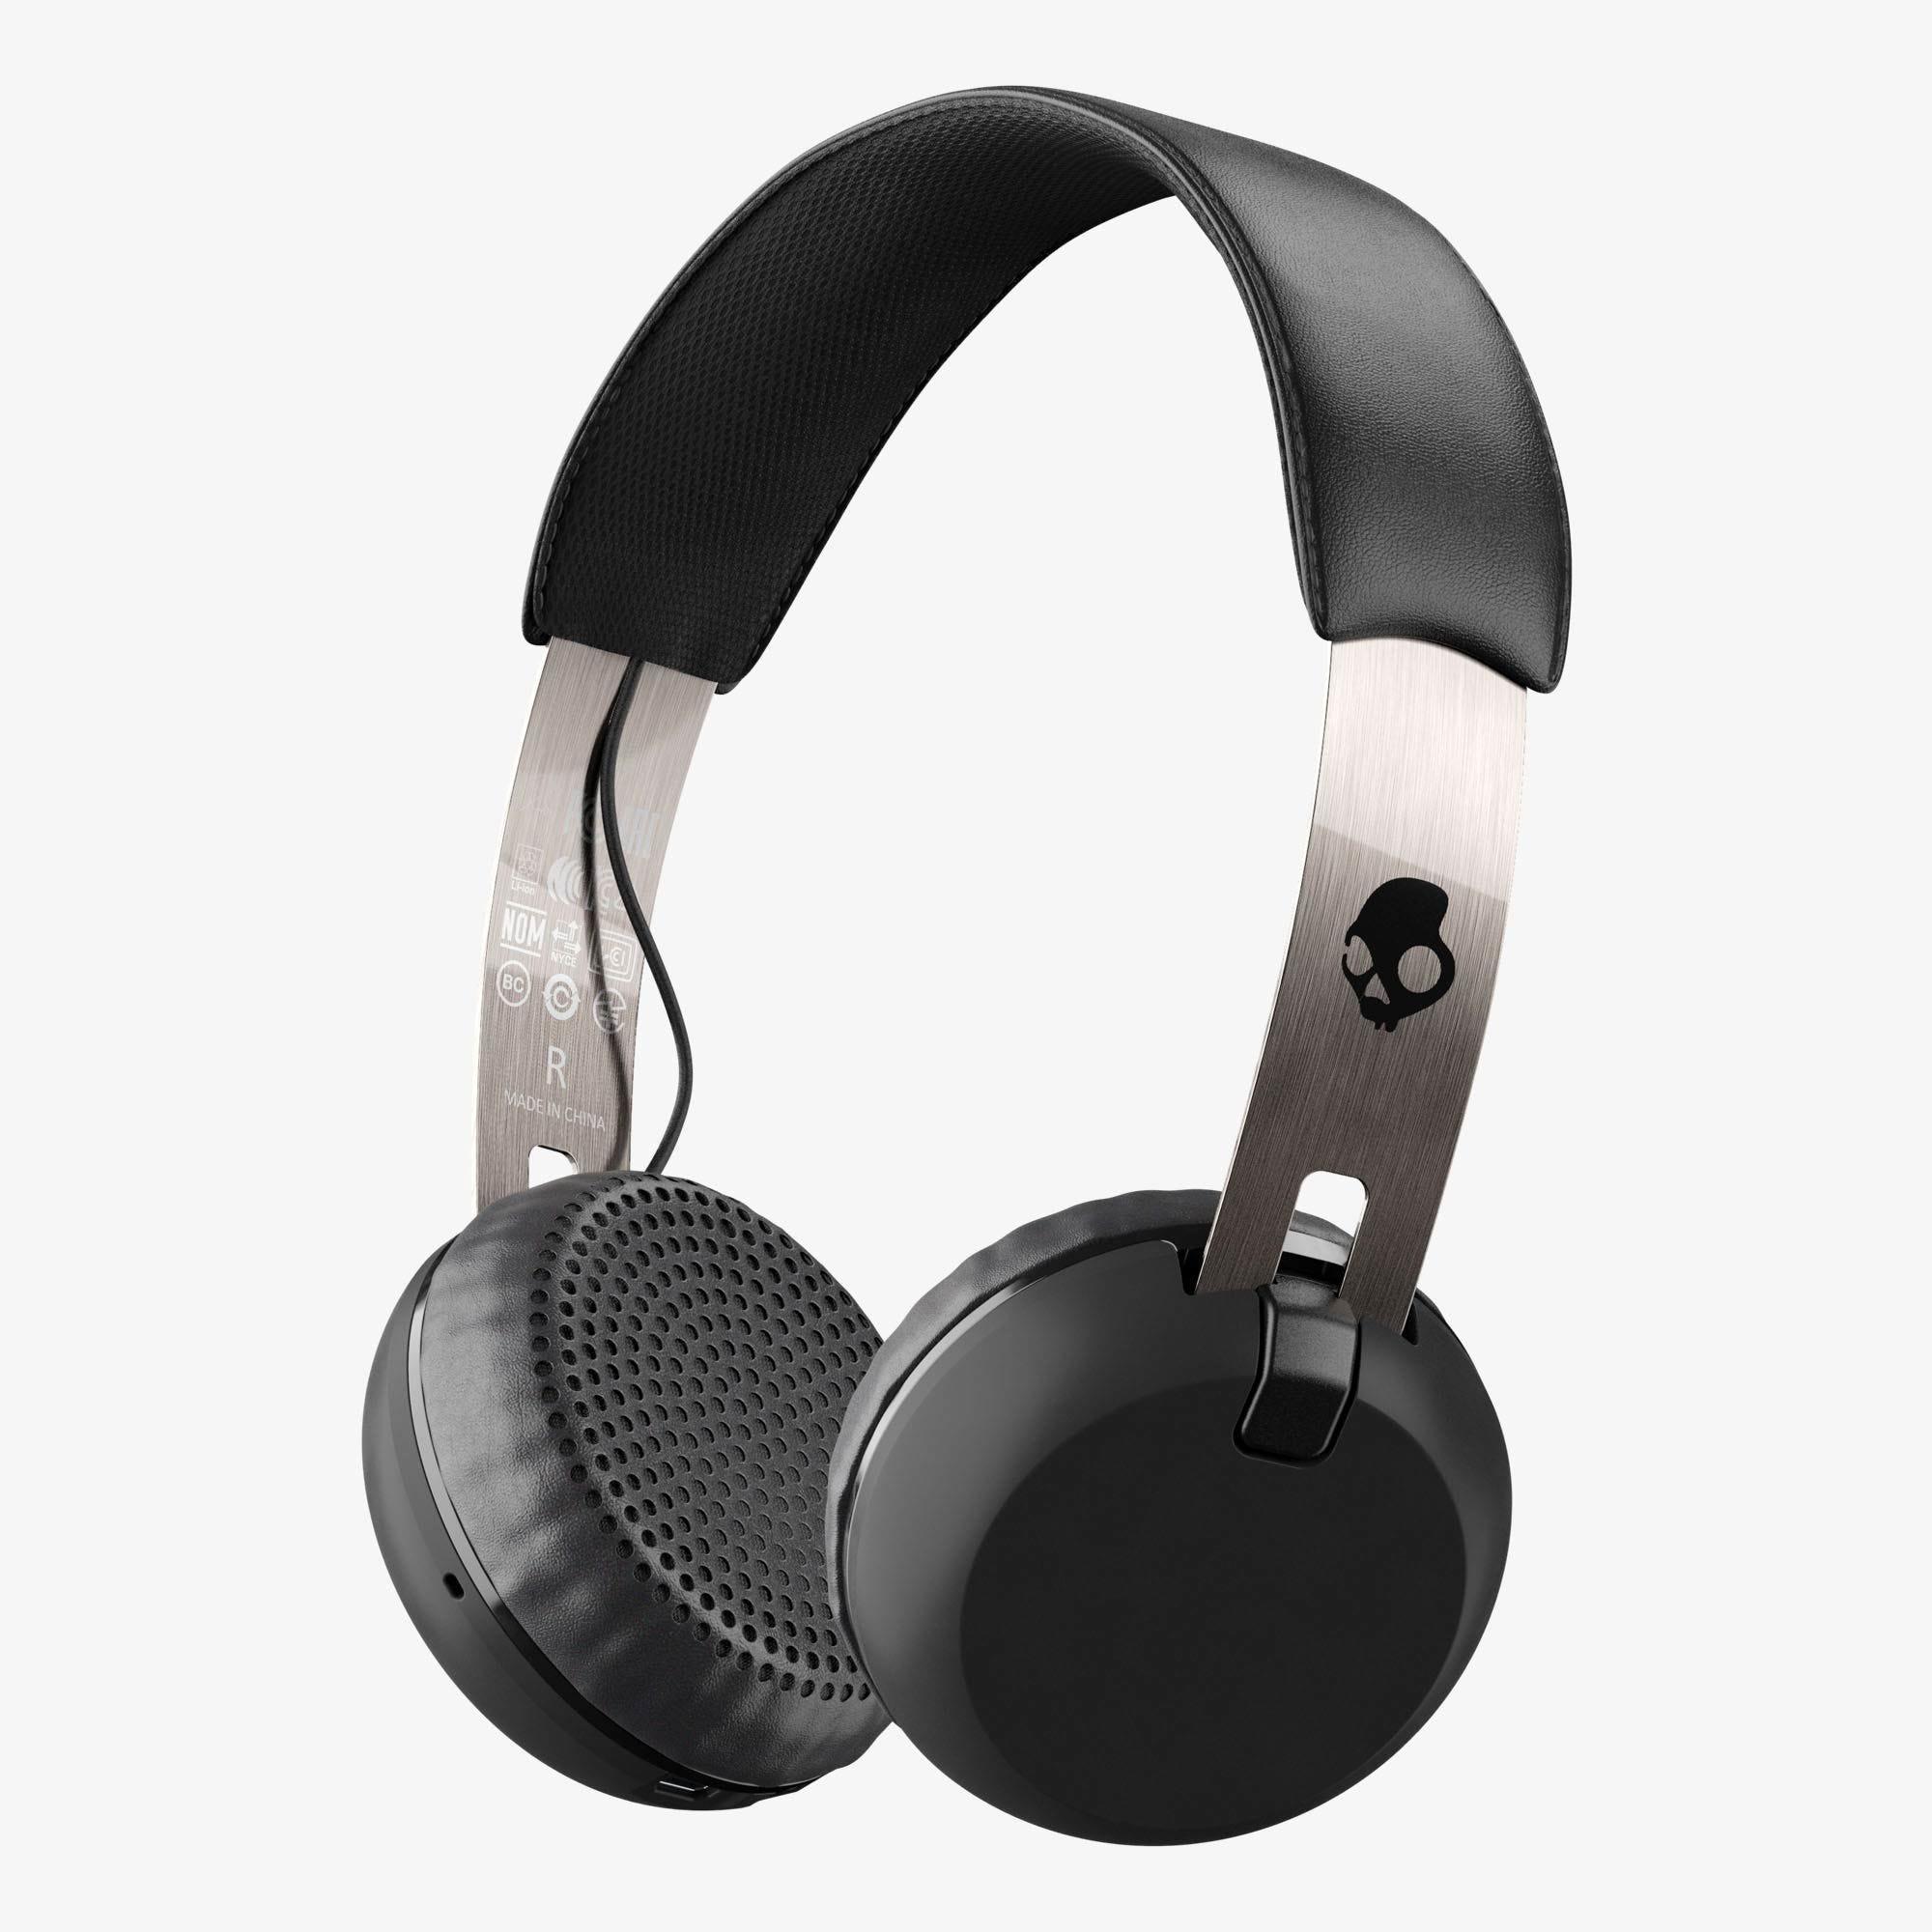 hight resolution of skullcandy headphone with mic wiring diagram